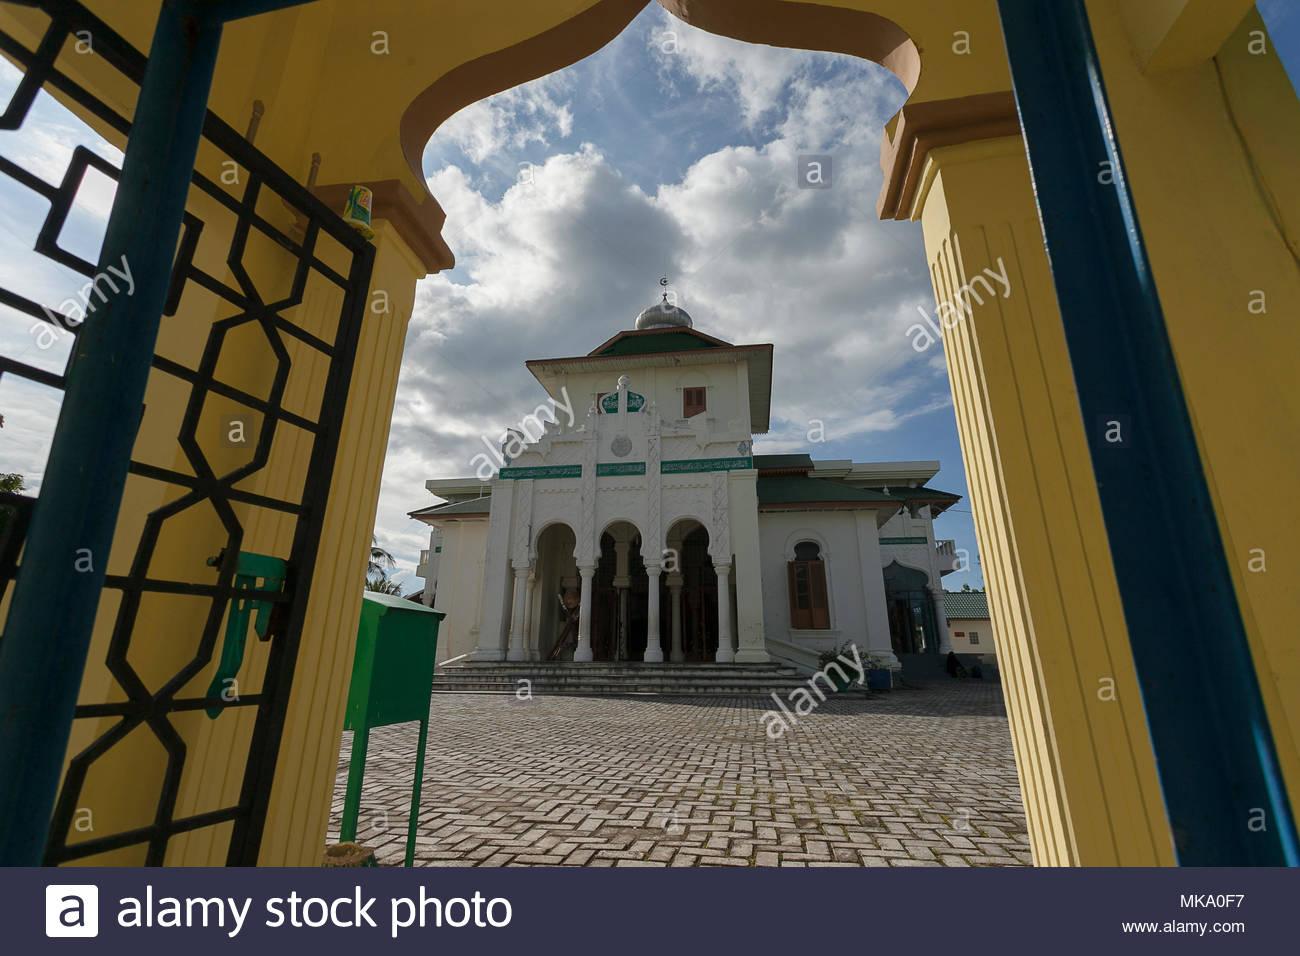 Aceh Besar Indonesia Stock Photos Masjid Baiturrahim Ulee Lheue Meuraxa